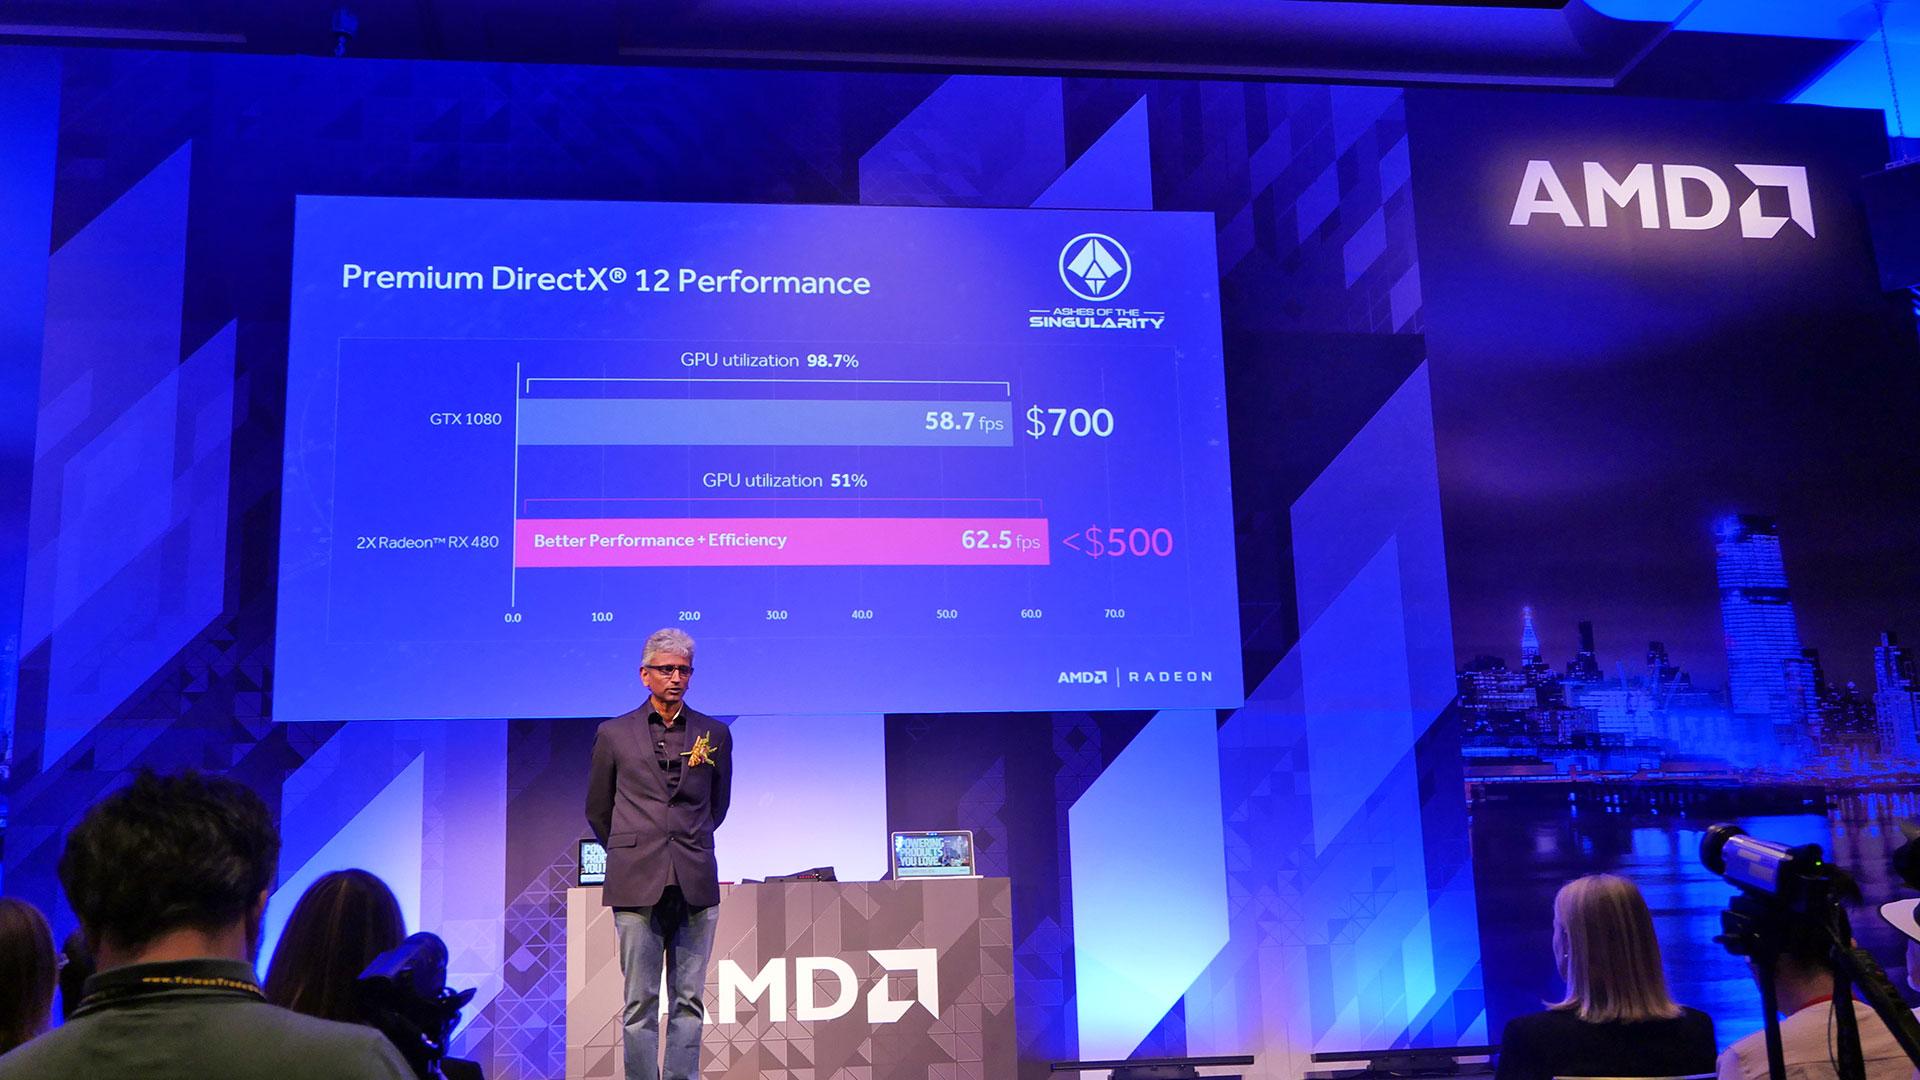 AMD Radeon RX 480_1